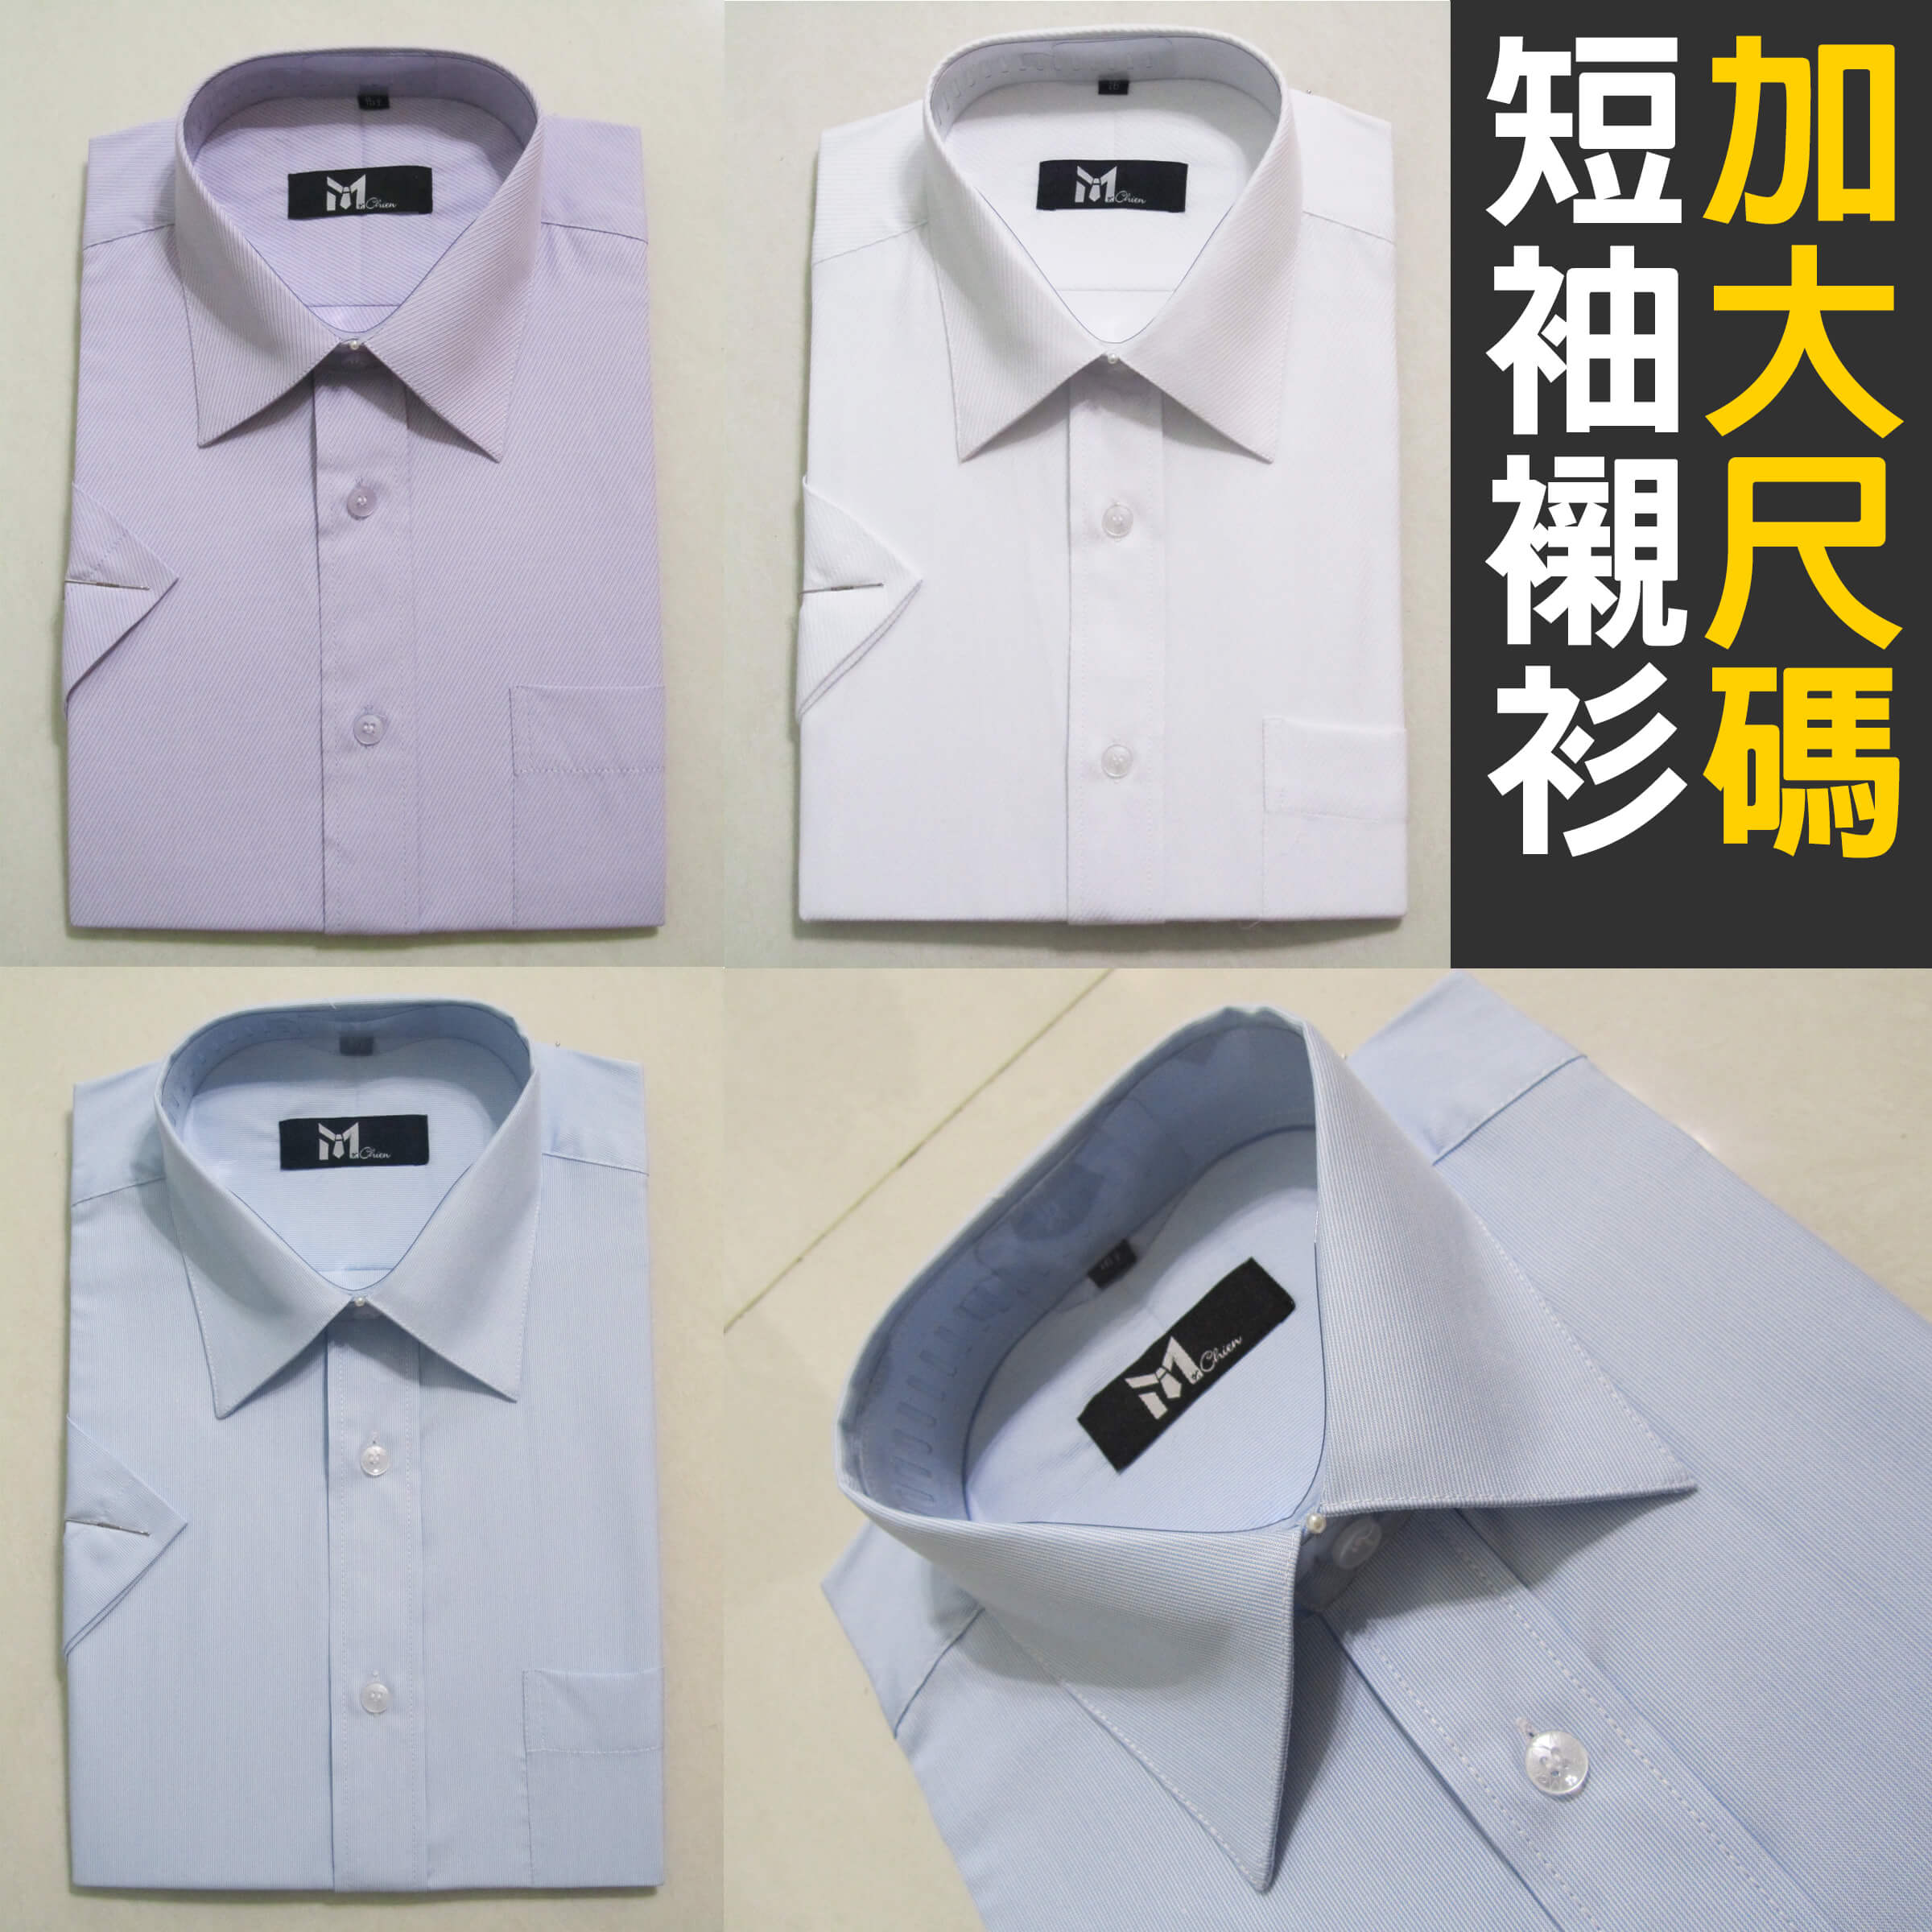 sun-e333特加大尺碼短袖條紋襯衫、上班族襯衫、標準襯衫、商務襯衫、正式場合襯衫、柔棉舒適襯衫、不皺免燙襯衫、細條紋襯衫(333-B518-01)白色斜條紋襯衫(333-B394-23)紫色斜條紋襯衫(333-B335-09)藍色直條紋襯衫 領圍:19.5、20.5、21.5、22.5